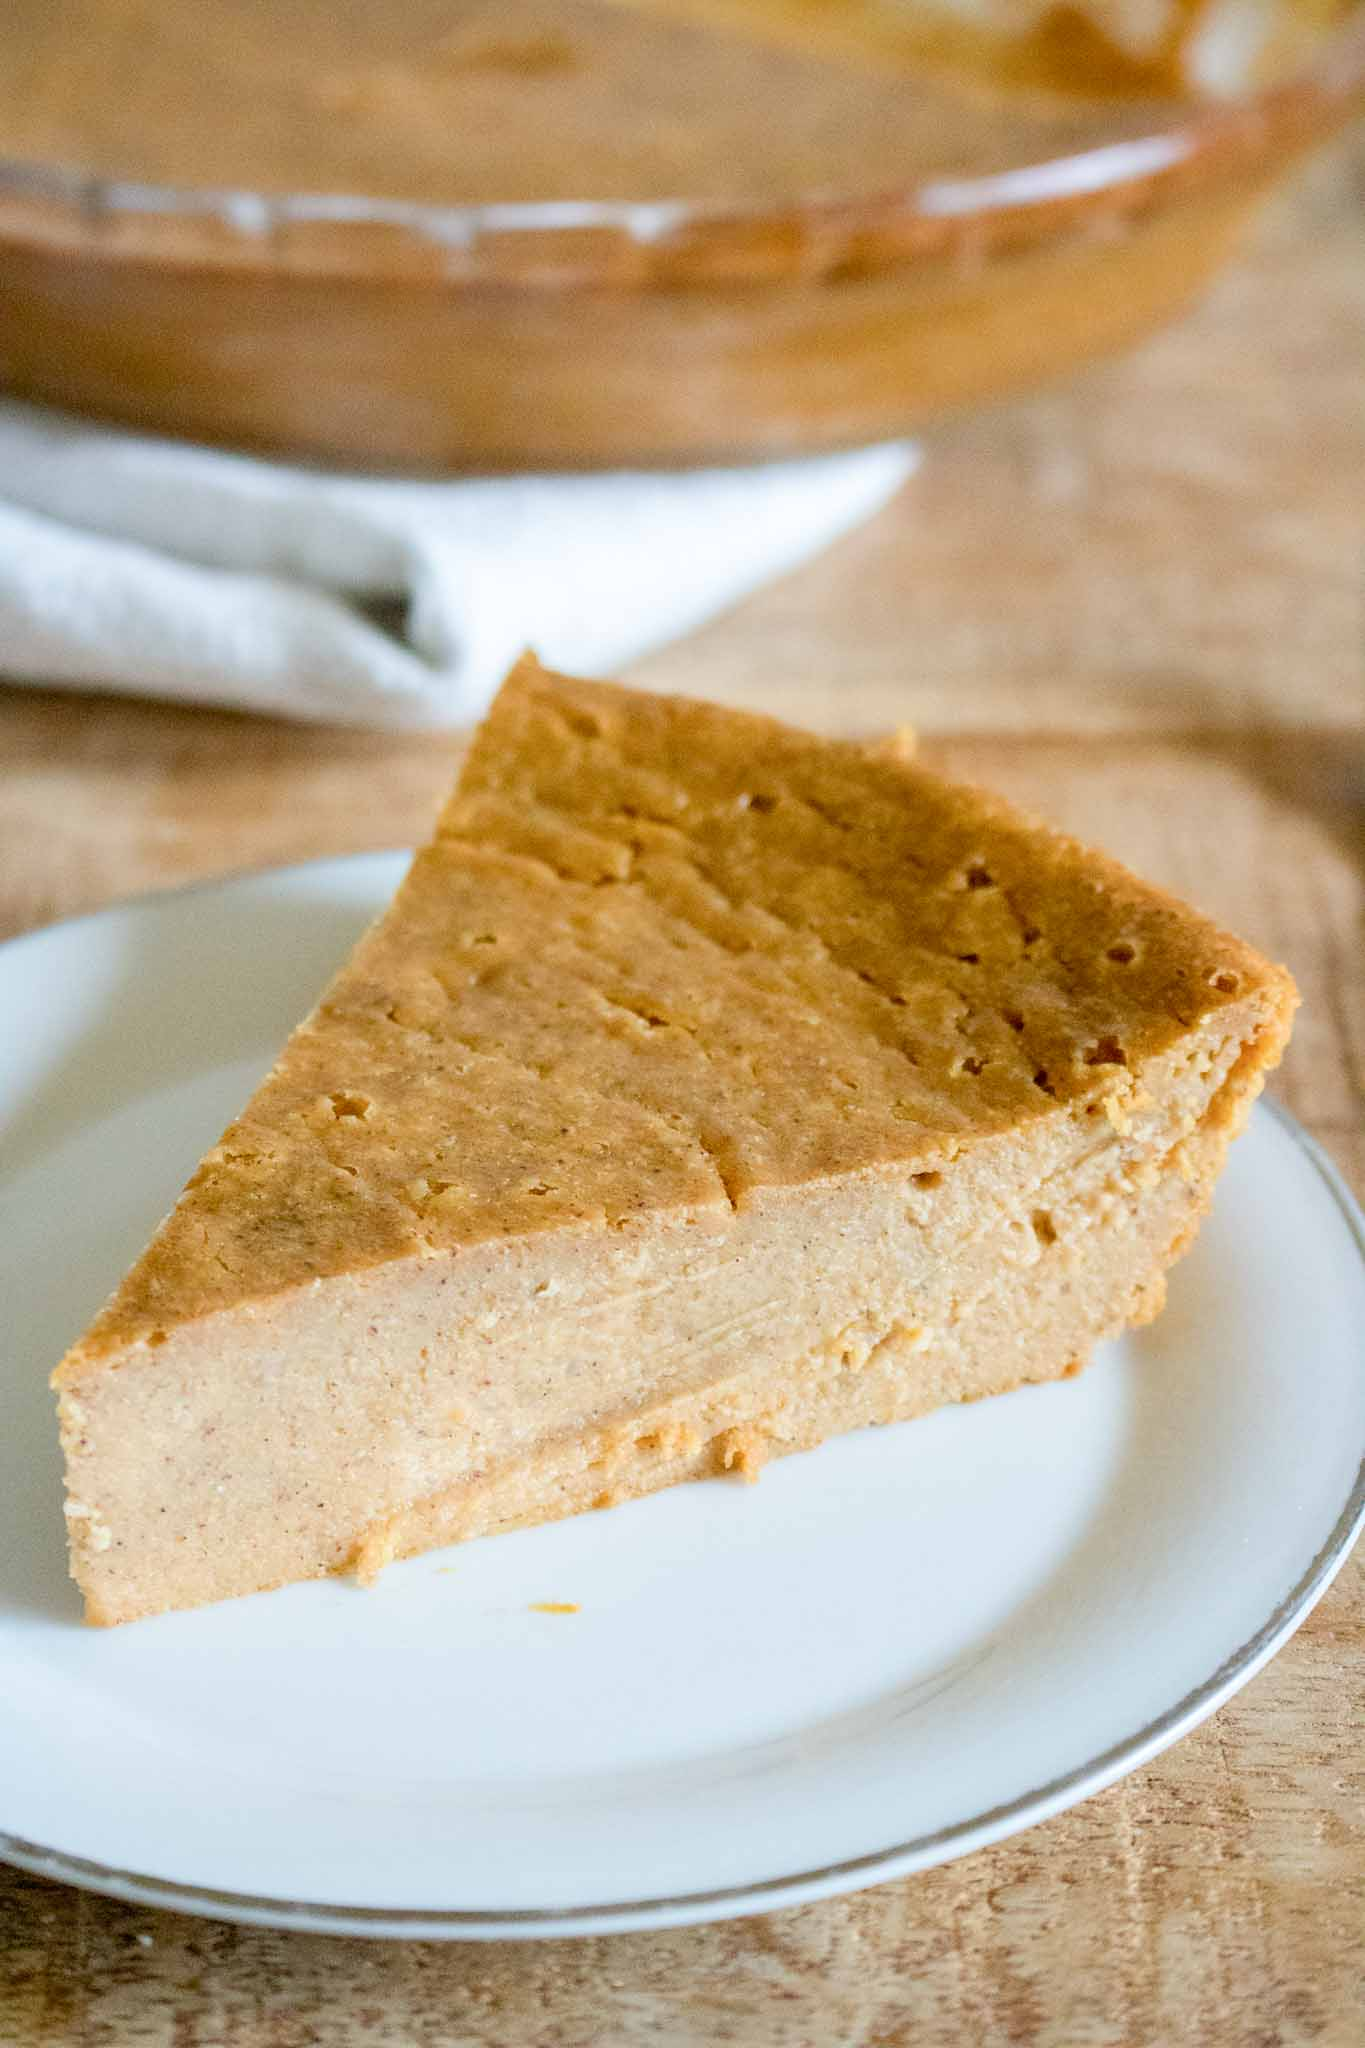 crustless pumpkin pie on plate